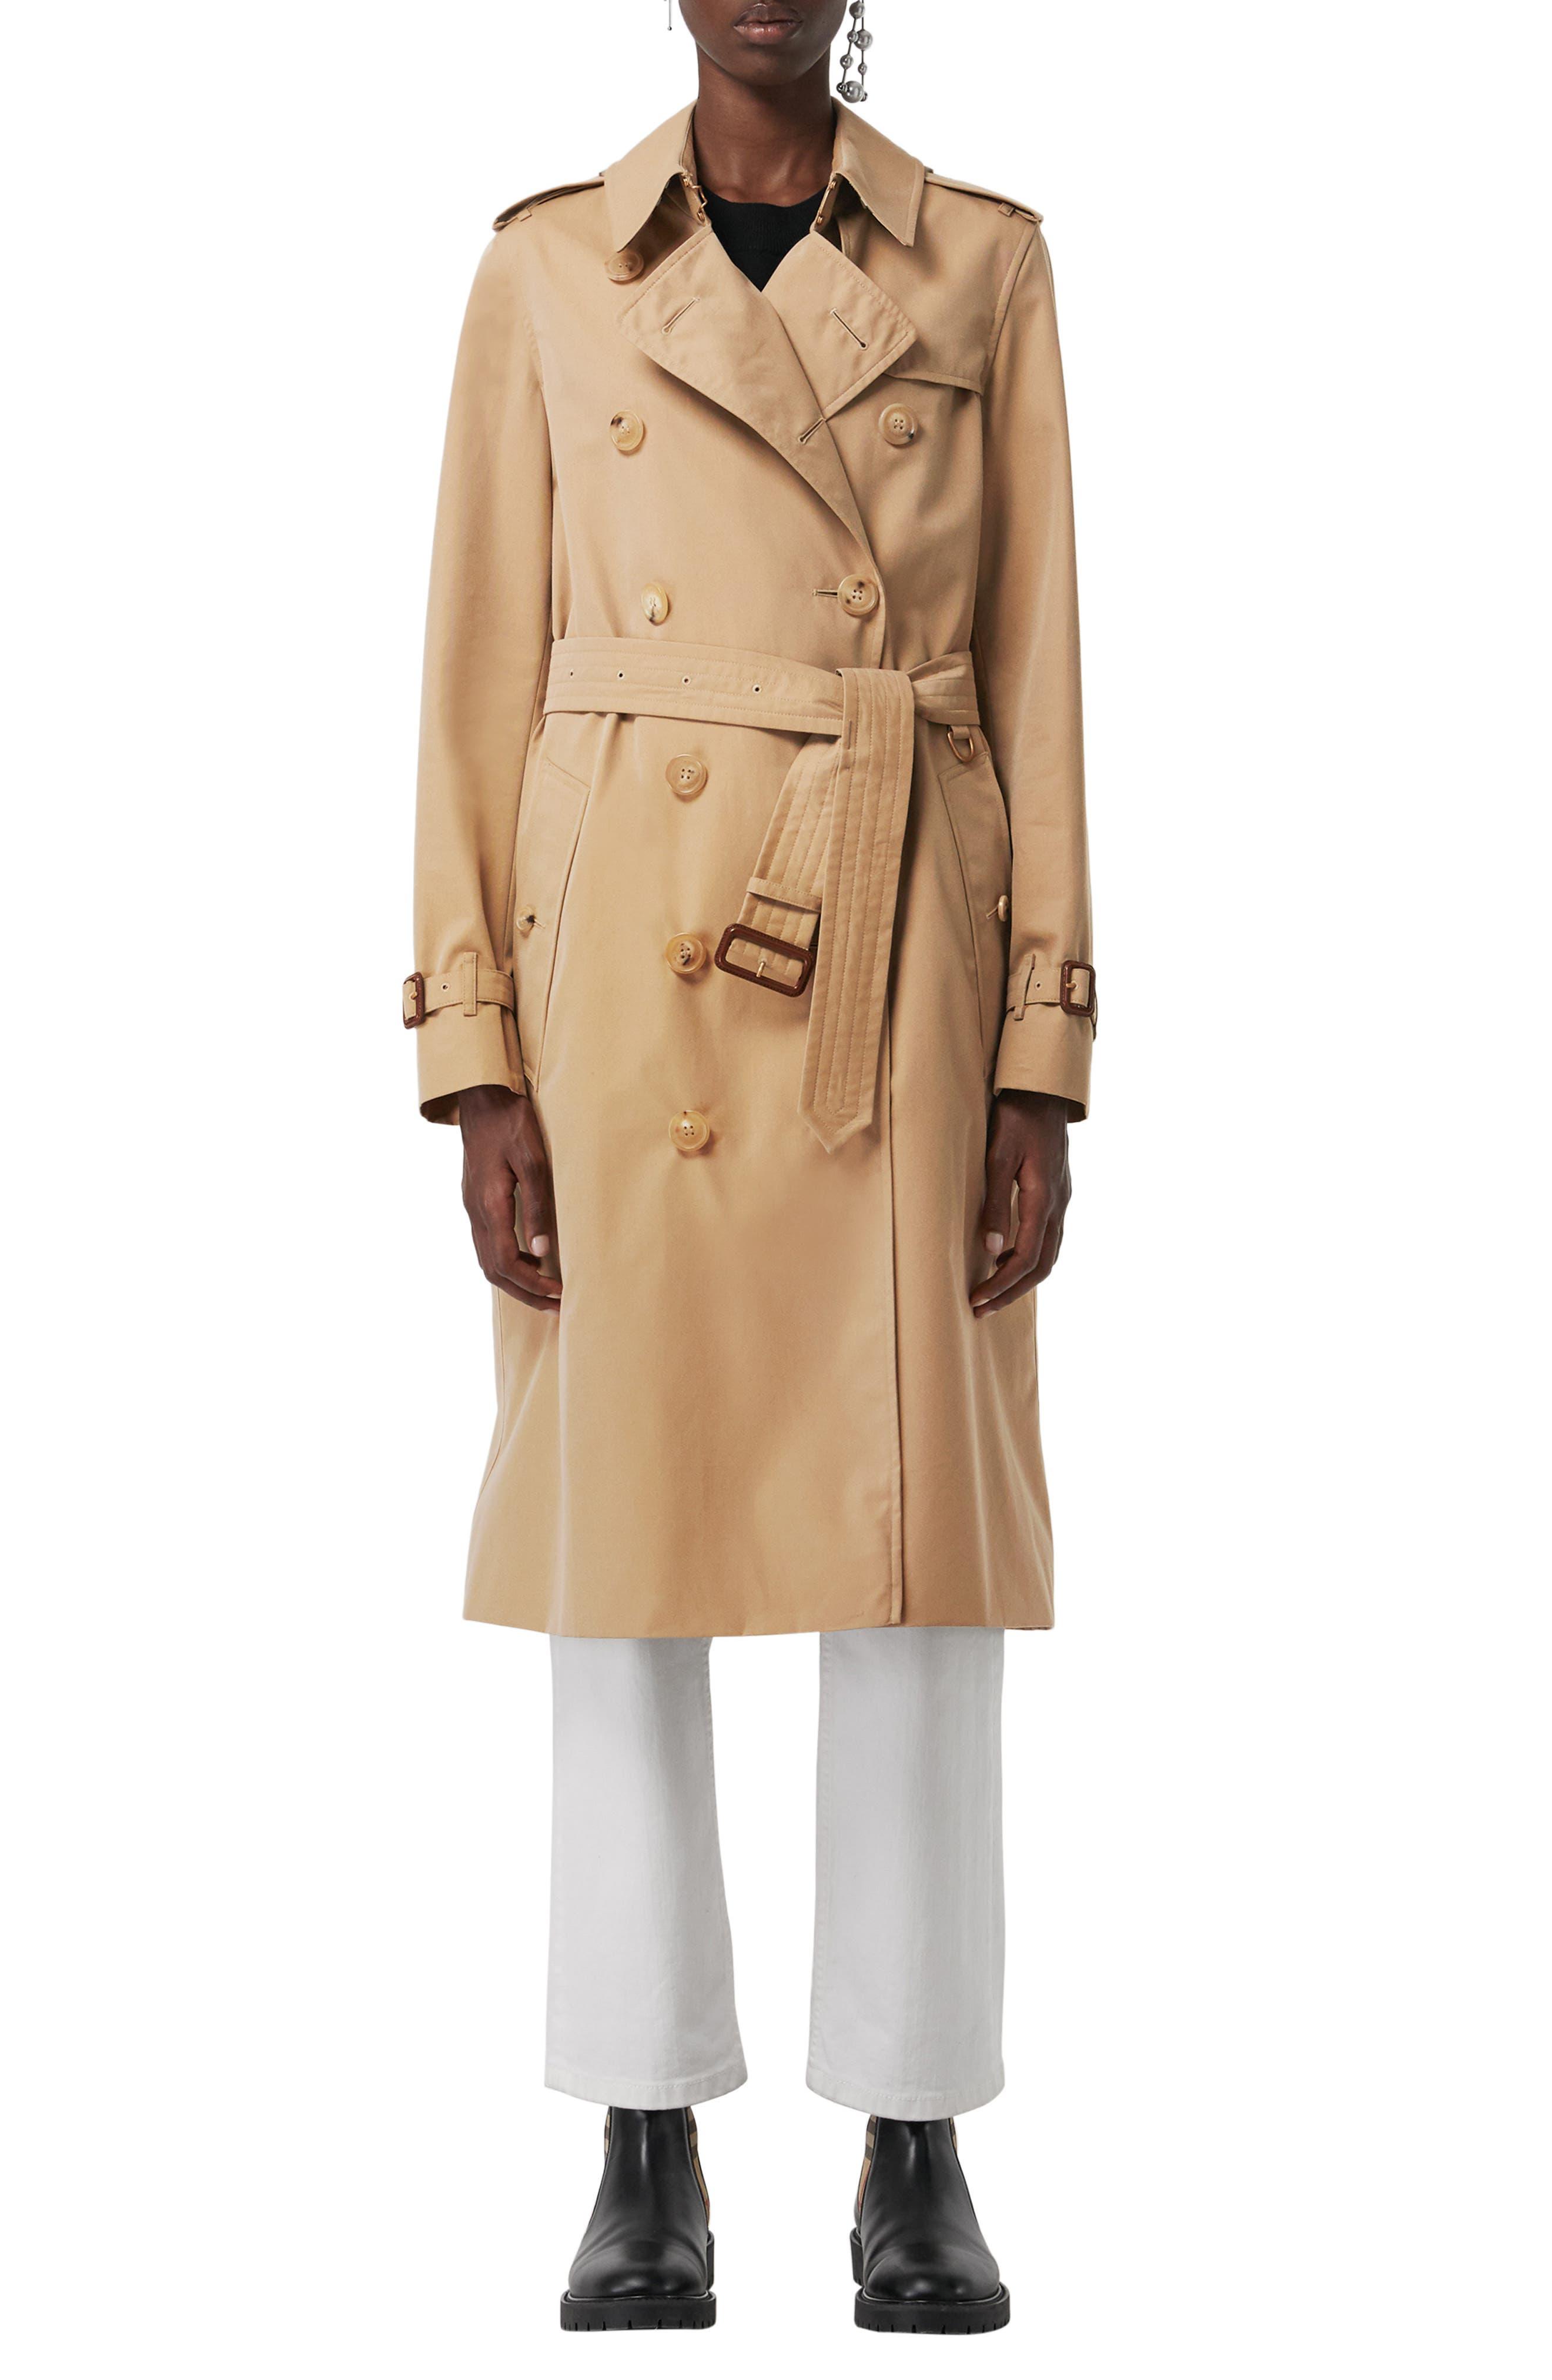 BURBERRY, Kensington Long Trench Coat, Main thumbnail 1, color, DARK HONEY